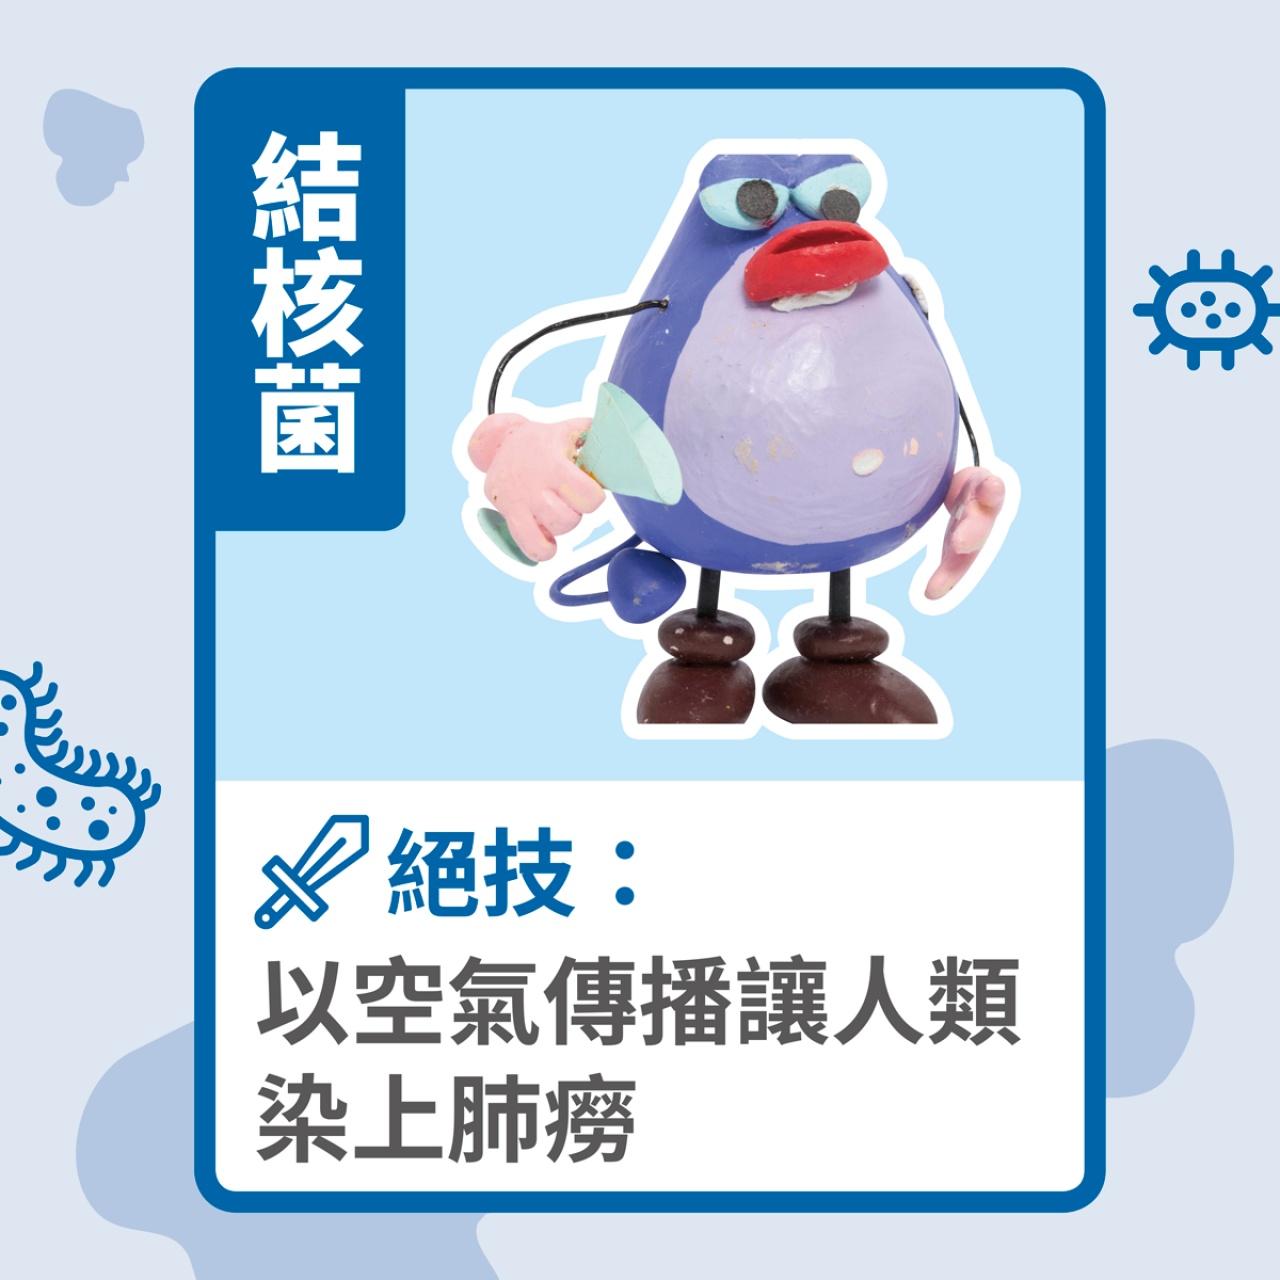 [img]https://cdn.hk01.com/media/images/239606/xlarge/261cf6b77f207f497fa04bcab371ce02.jpg[/img]